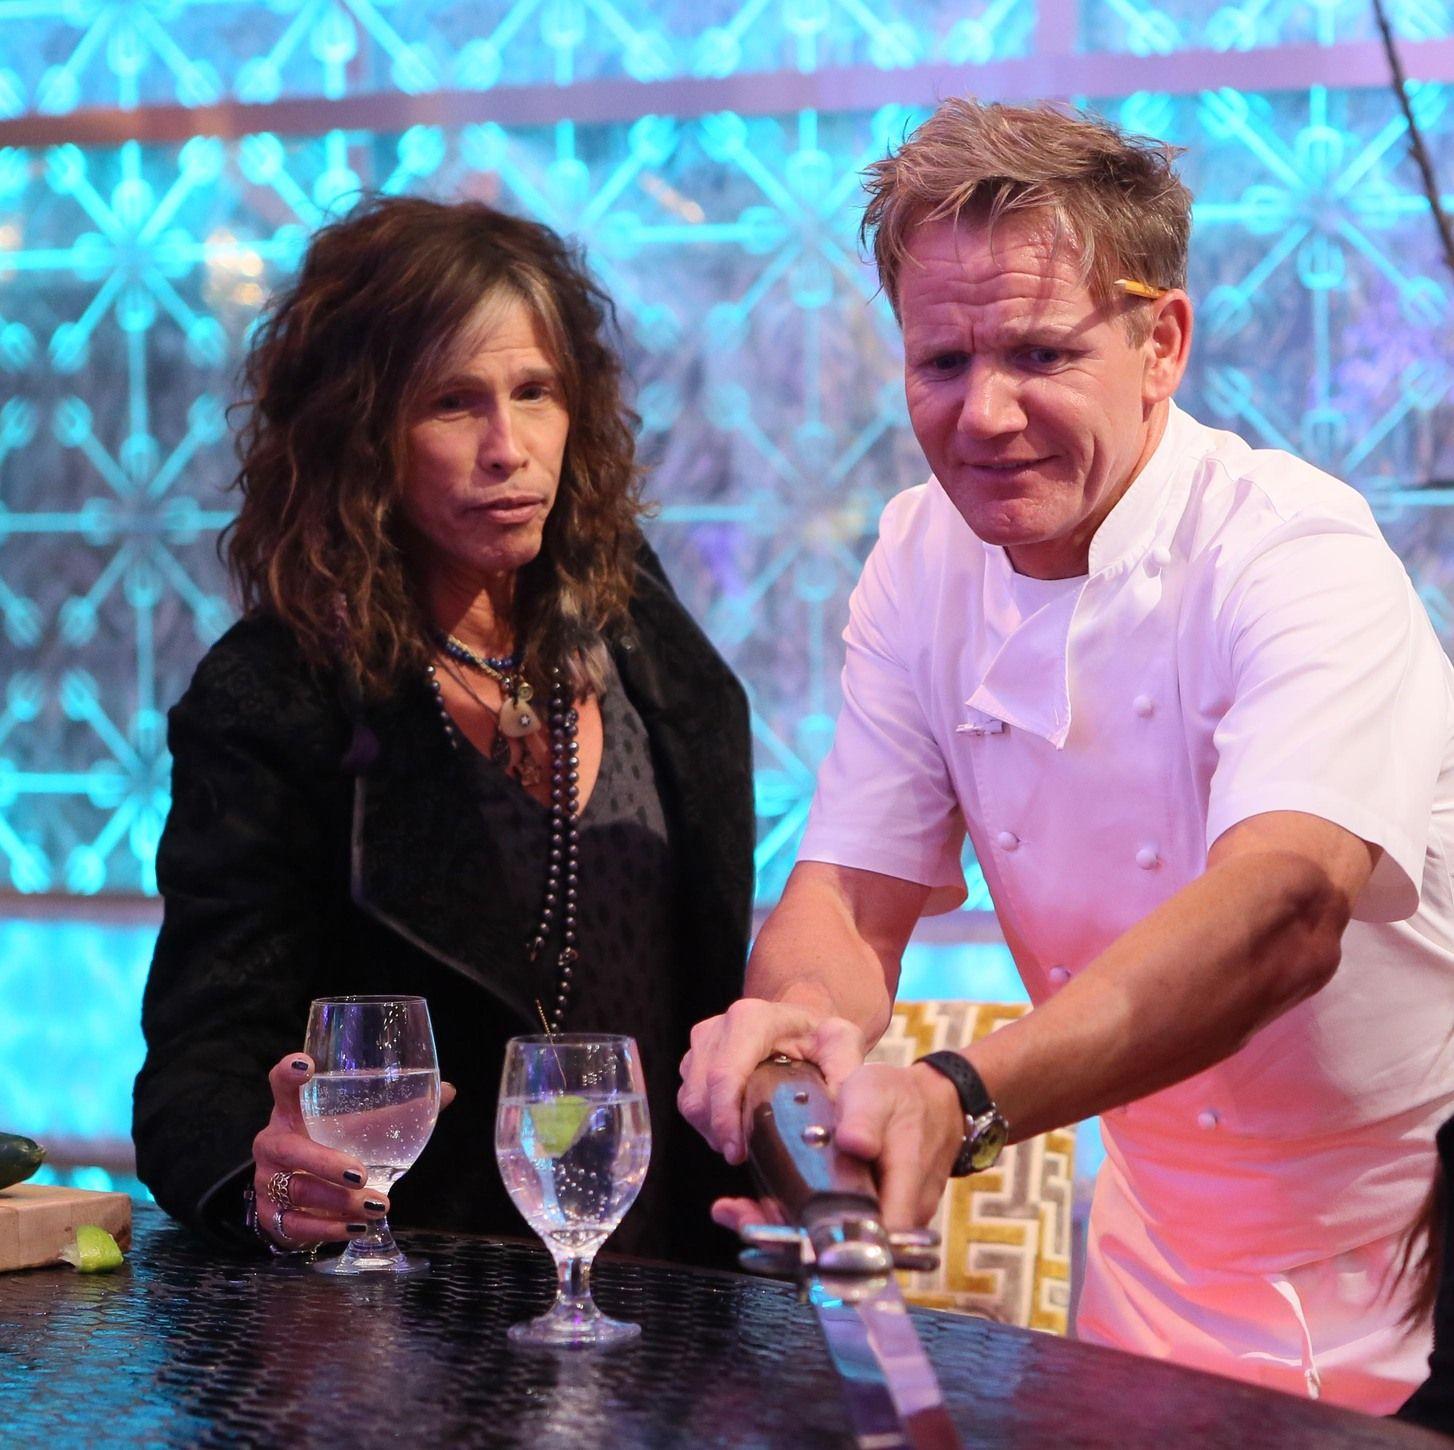 gordon ramsay and steven tyler talking knives in hell s kitchen